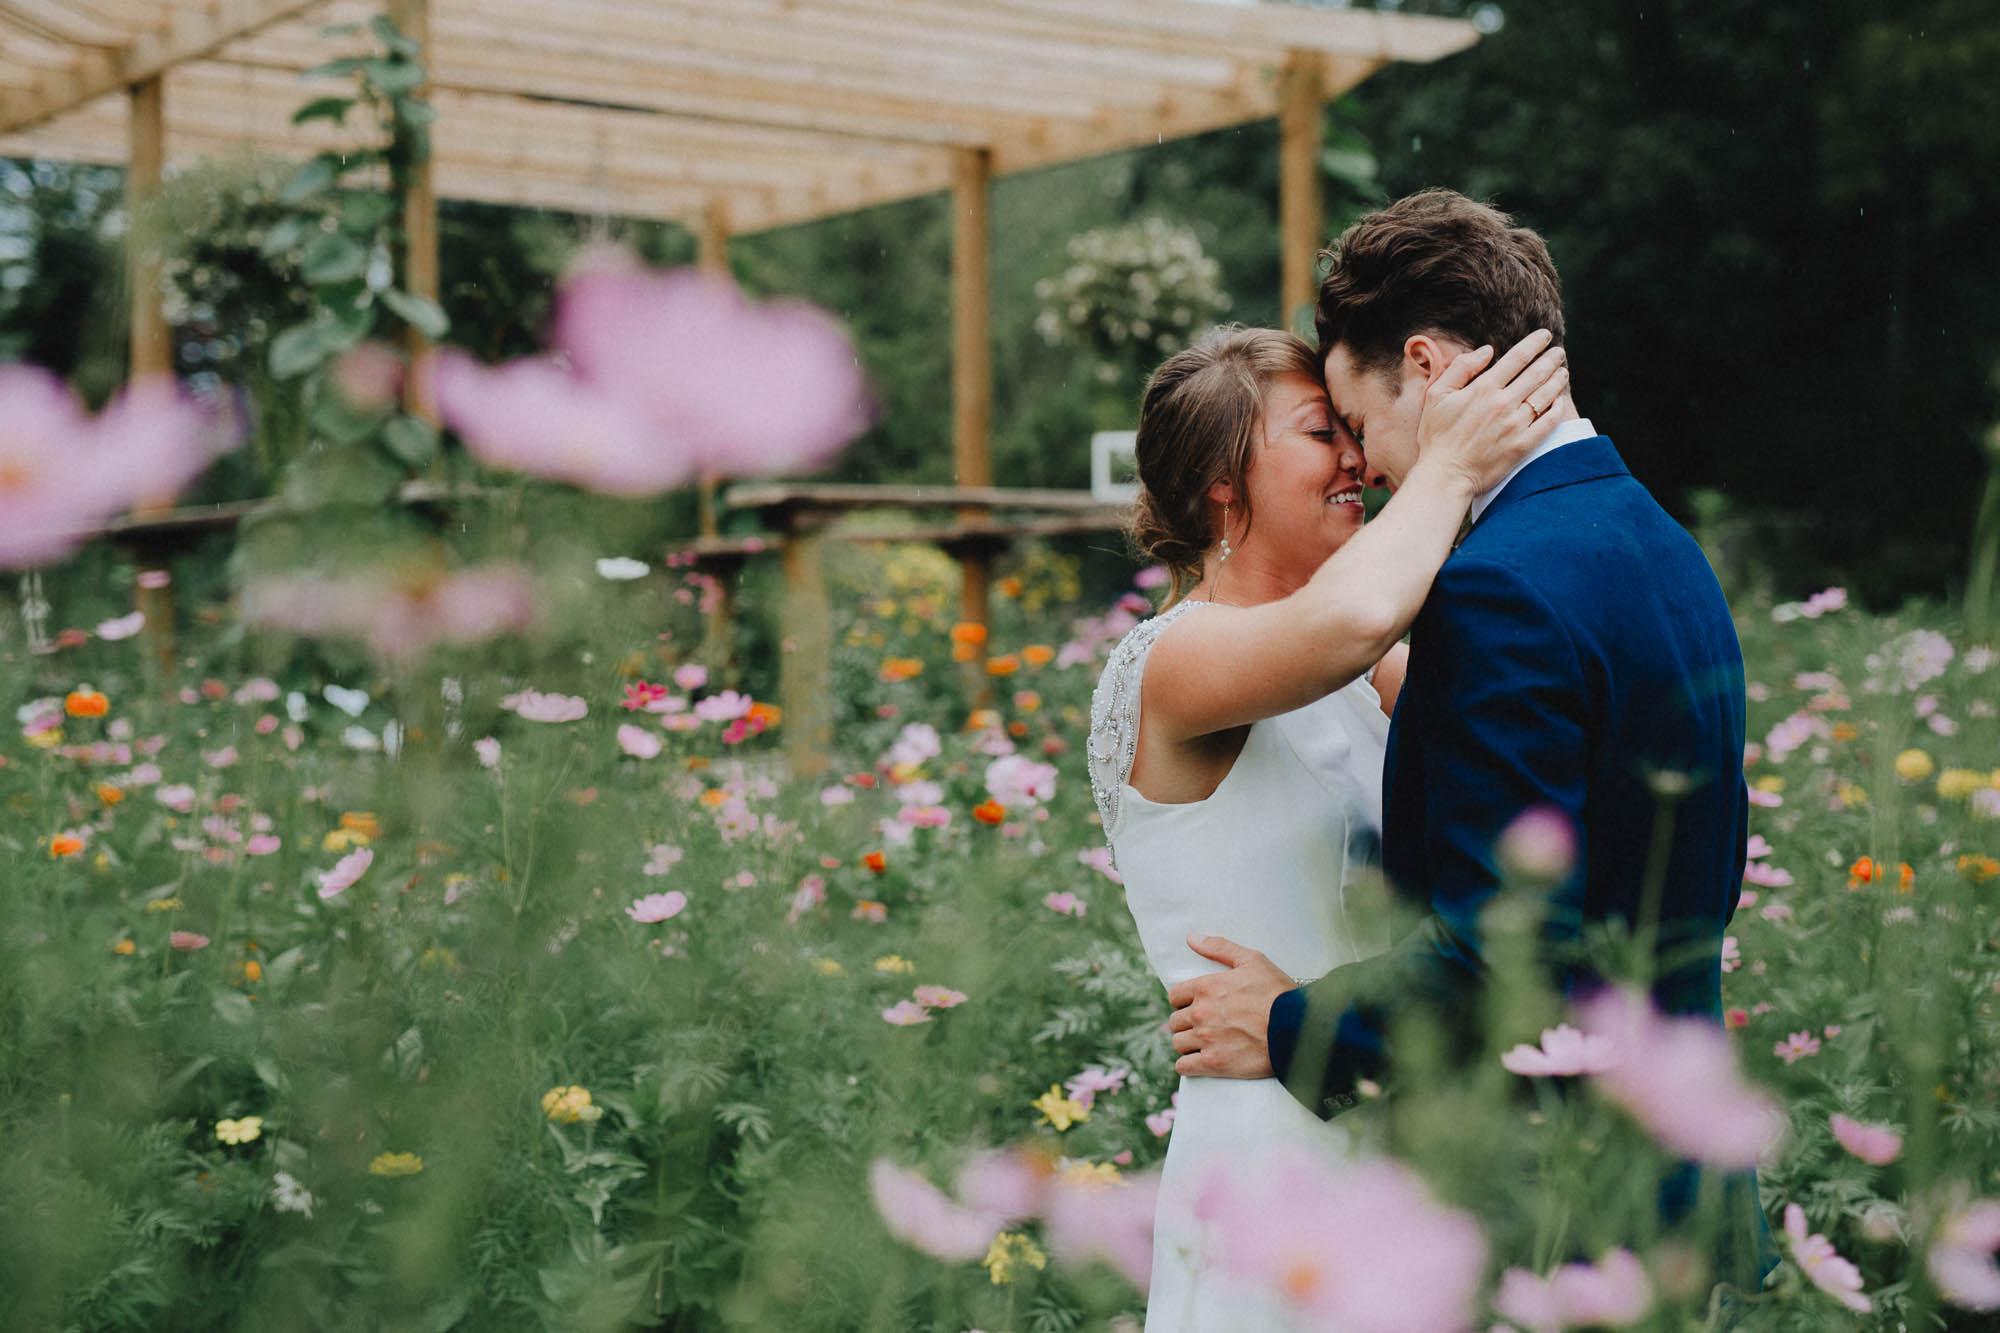 Leah-Graham-Michigan-Outdoor-DIY-Wedding-037@2x.jpg